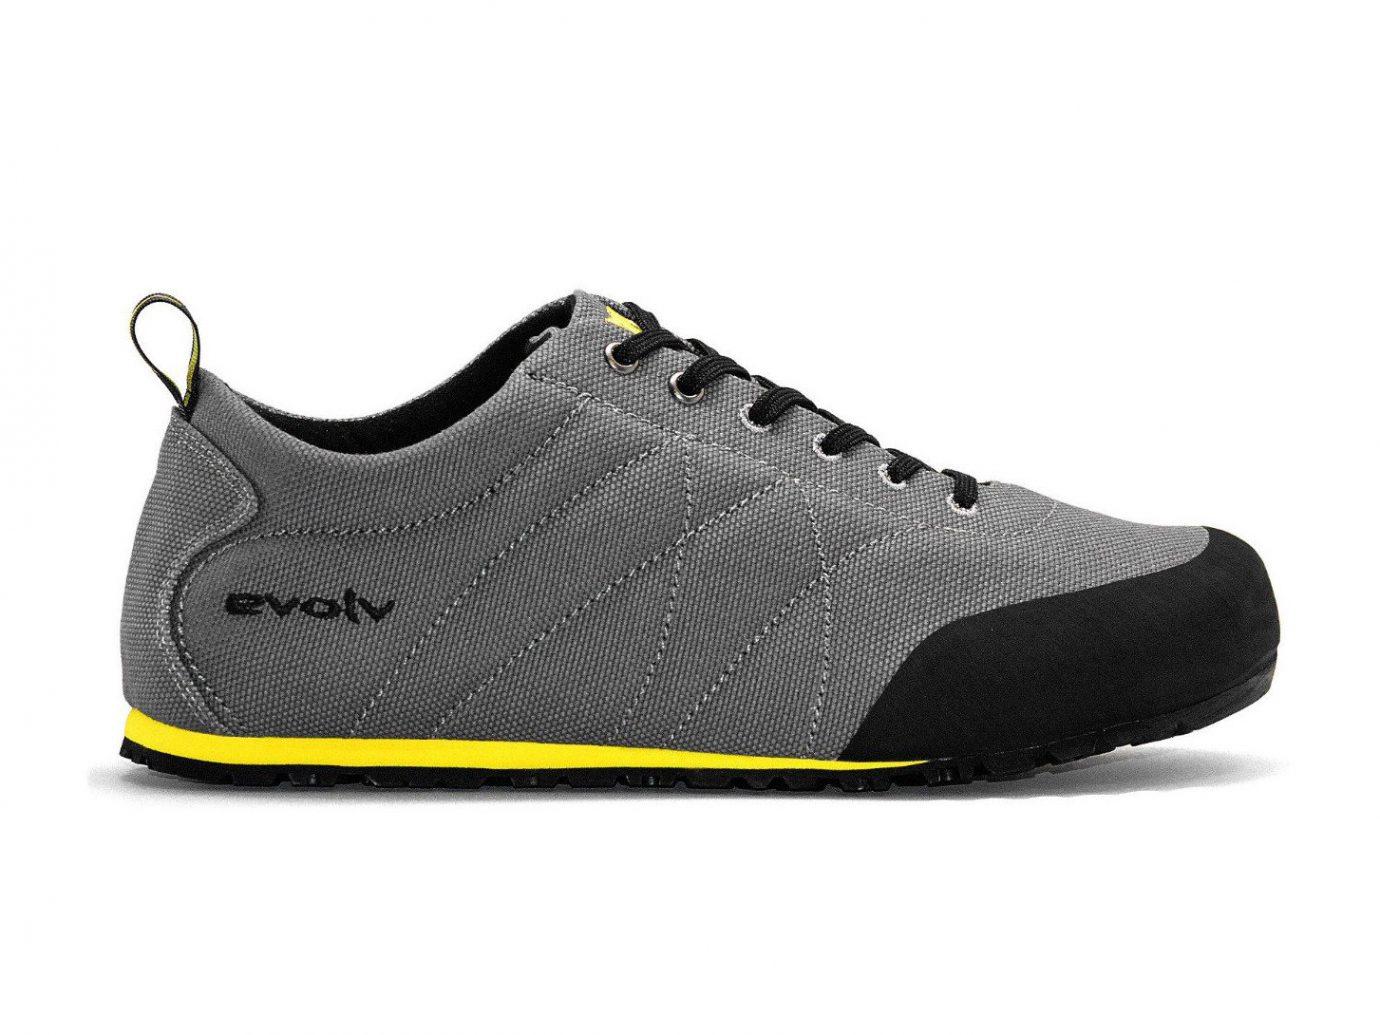 Travel Tech Travel Tips footwear shoe black clothing running shoe leather athletic shoe sneakers walking shoe cross training shoe tennis shoe outdoor shoe textile